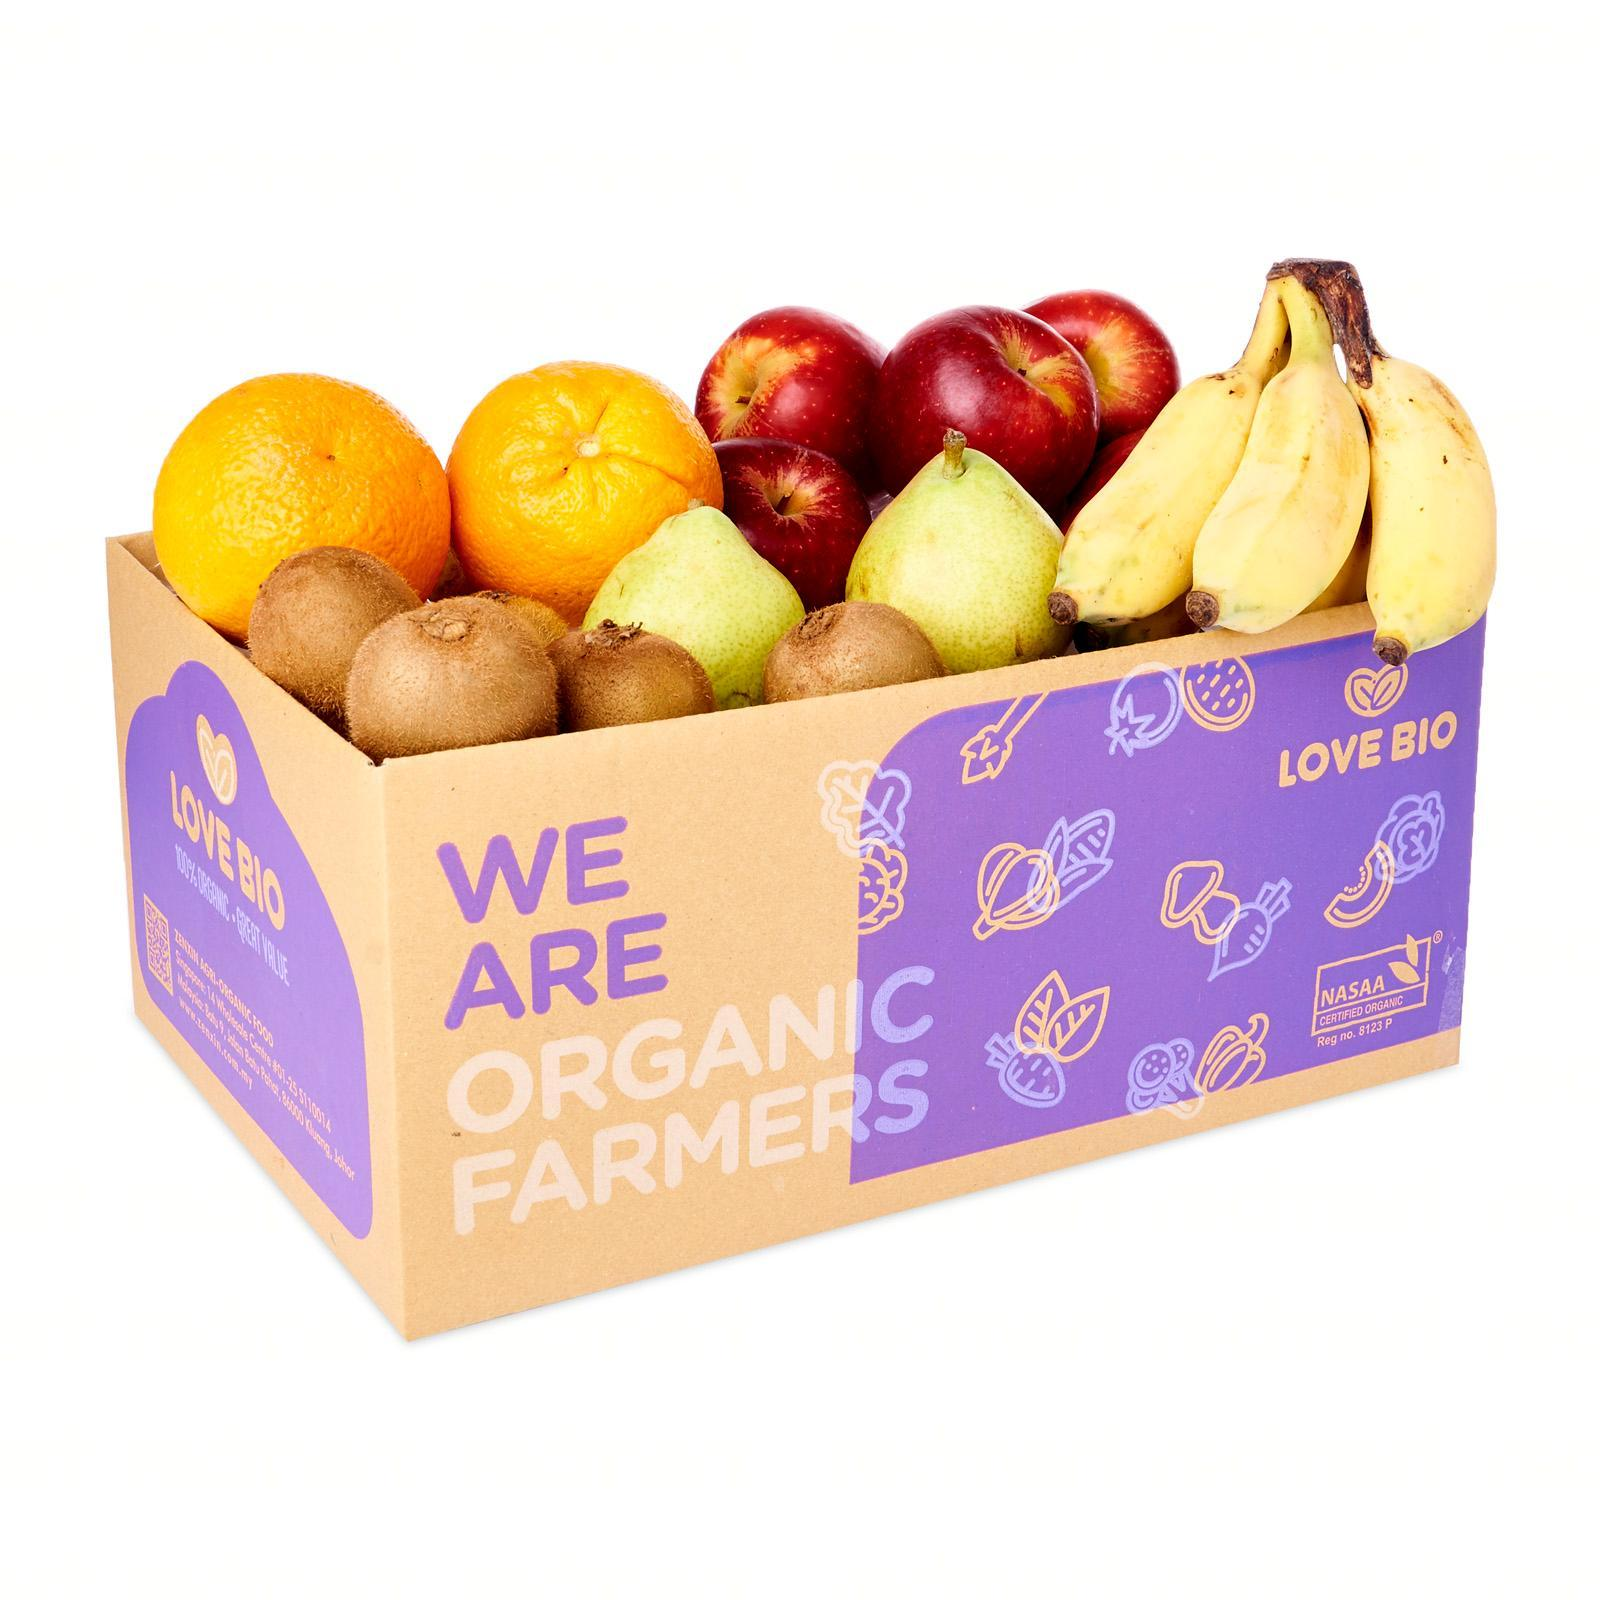 LOVE BIO Organic Fruit Box 2-3kg